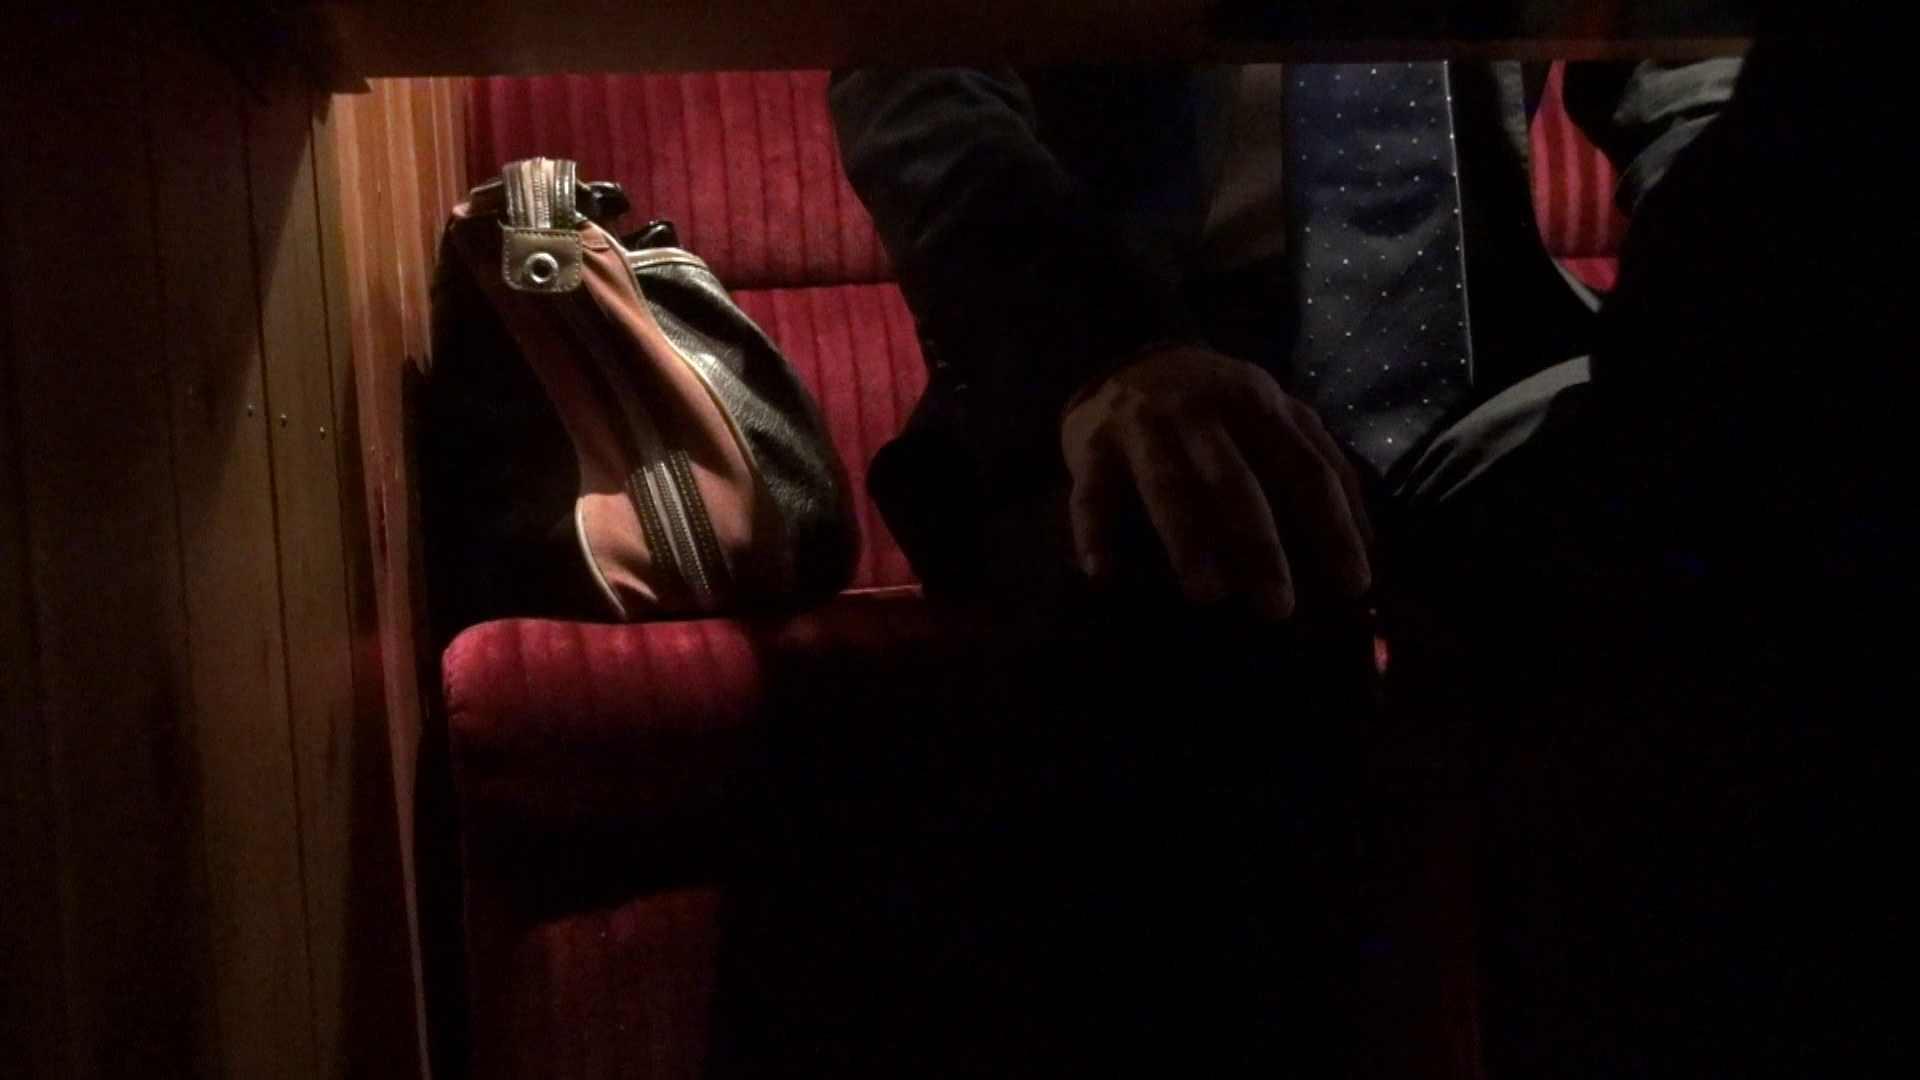 episode1 ヒロトさんと保険外交員との顔合わせ 寝取り・他人棒  69pic 16